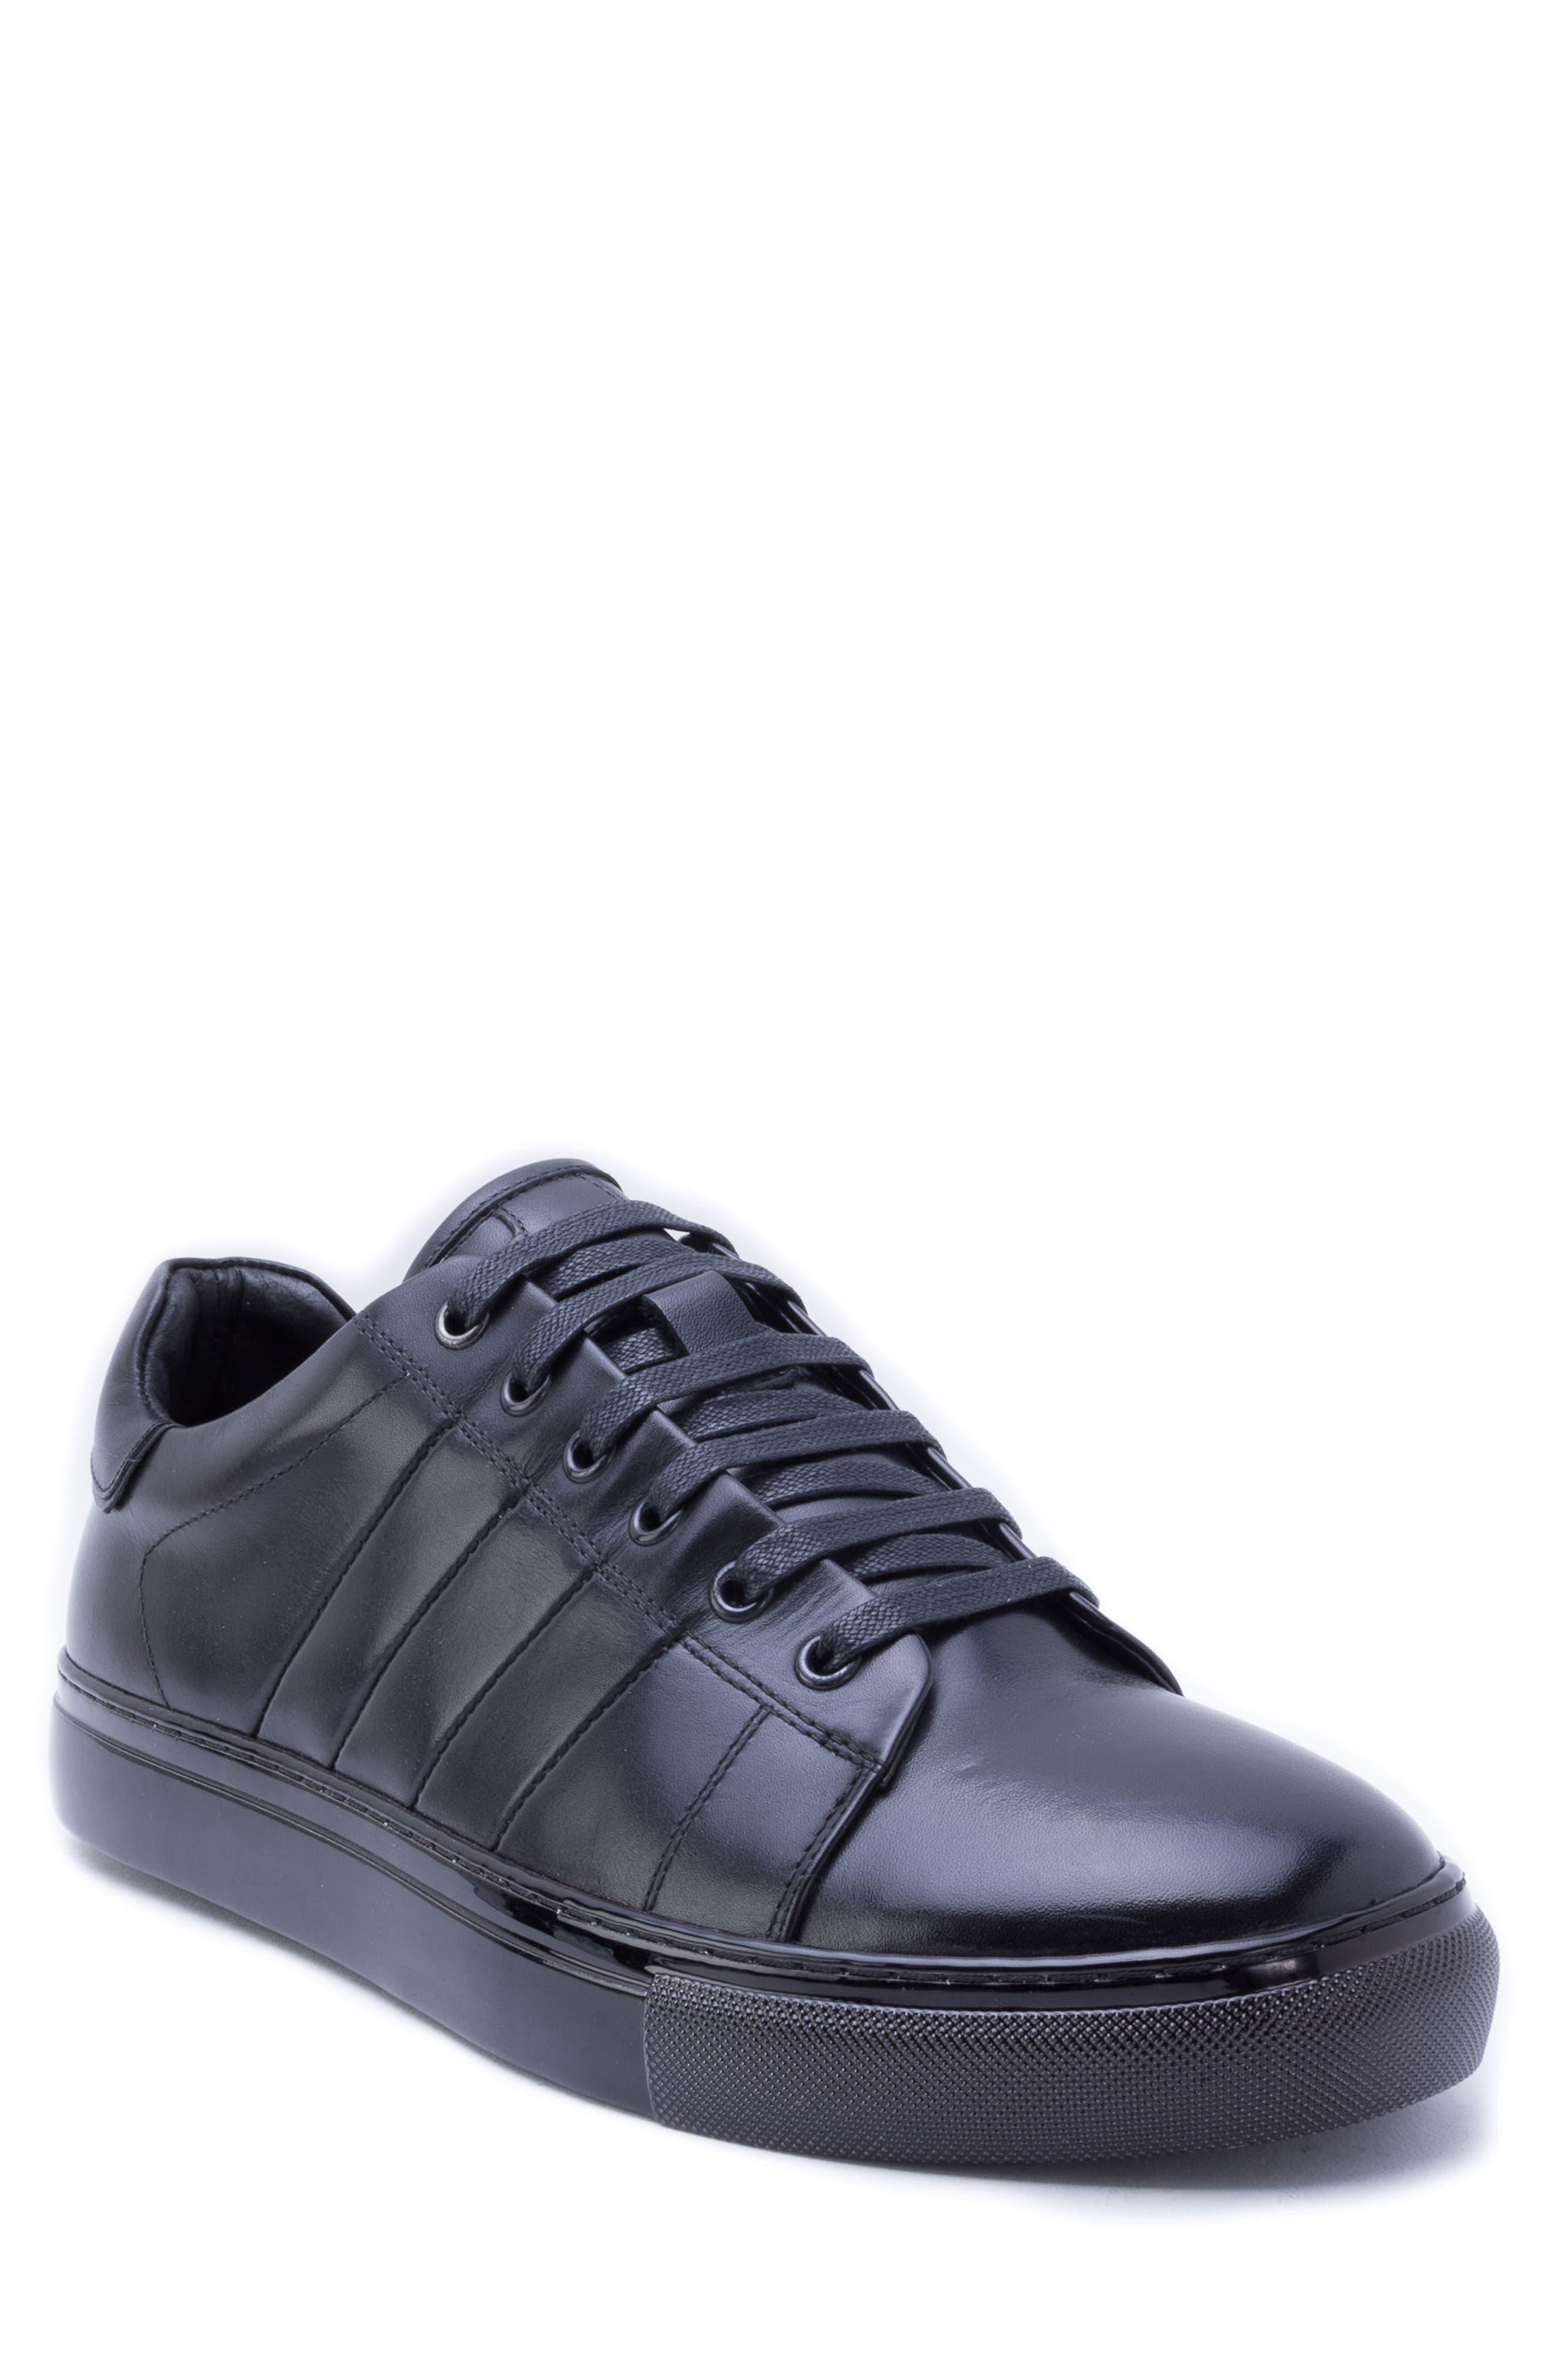 Hackman Sneaker,                         Main,                         color, BLACK LEATHER